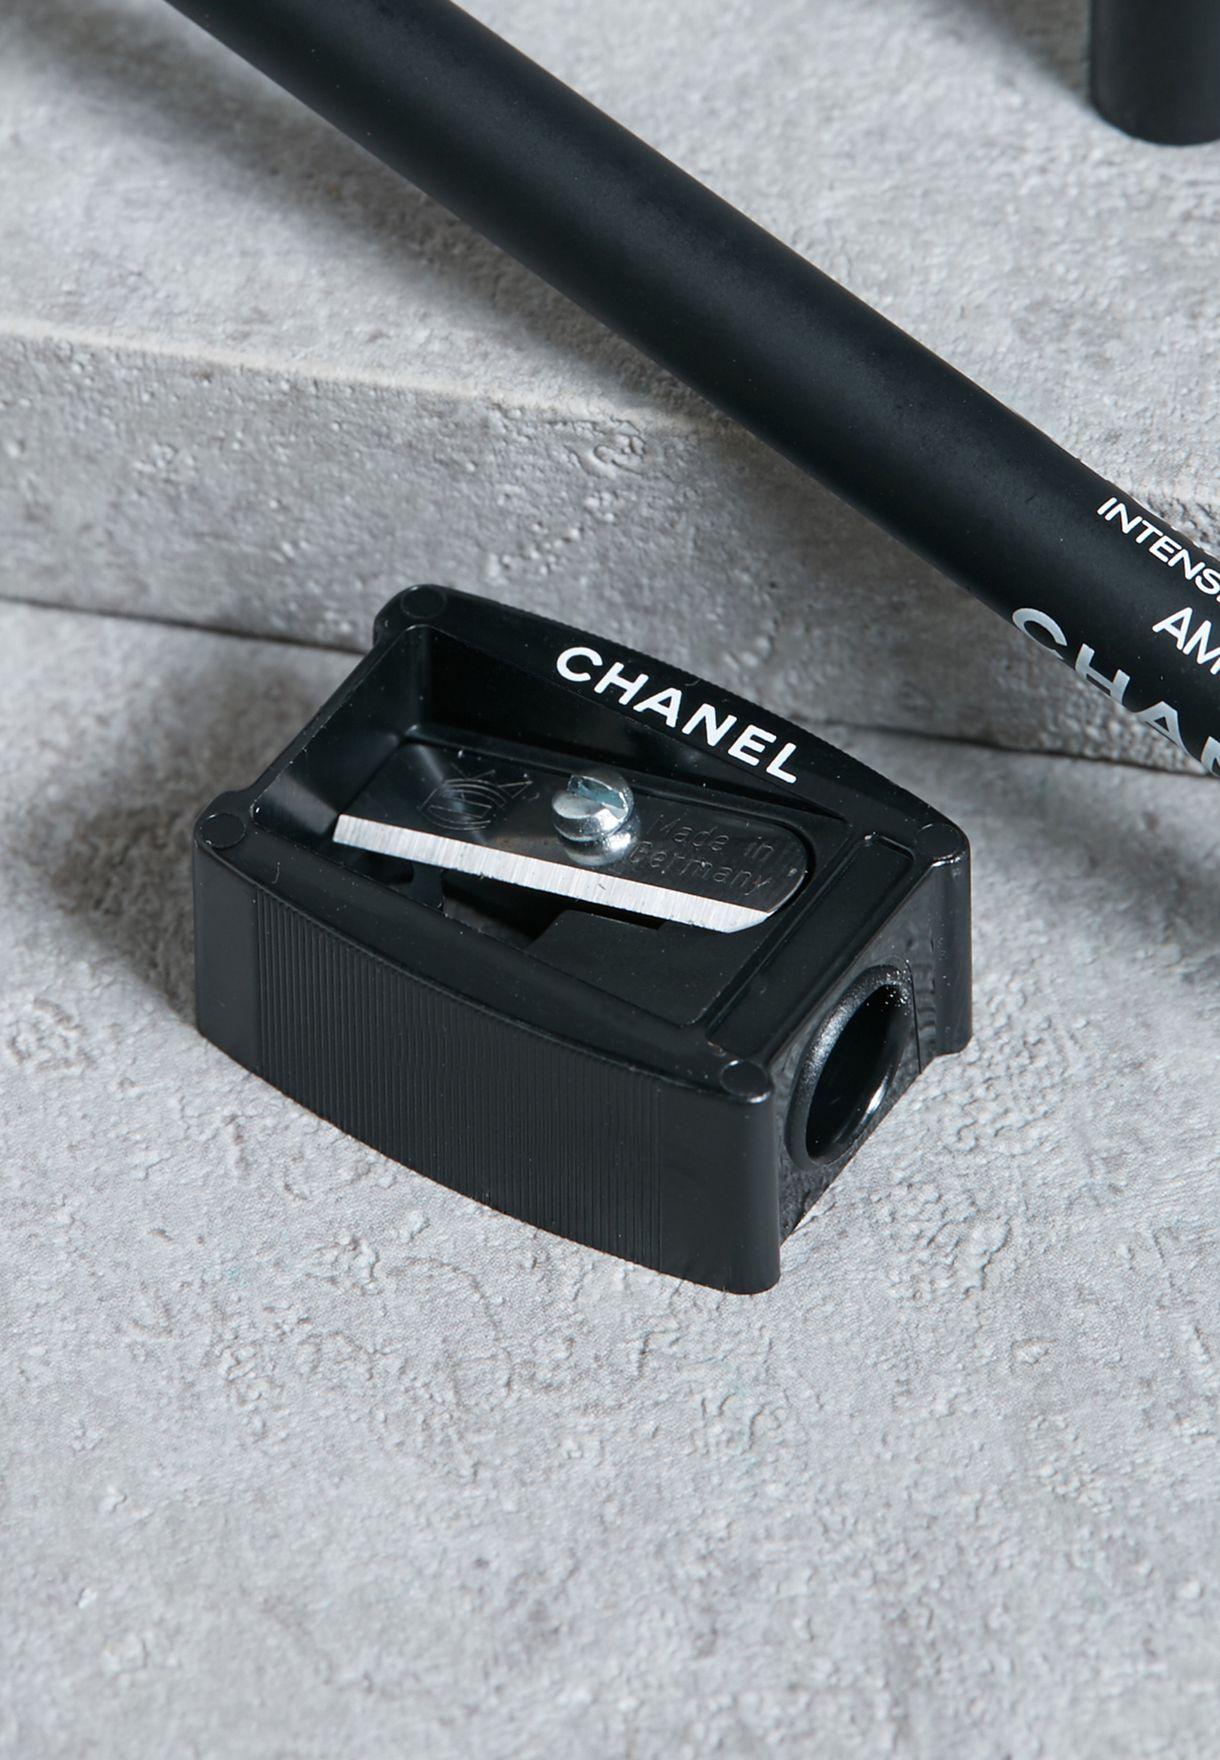 15869fb42 تسوق قلم كحل-لي كرايون كول ماركة شانيل لون ألوان محايدة ...